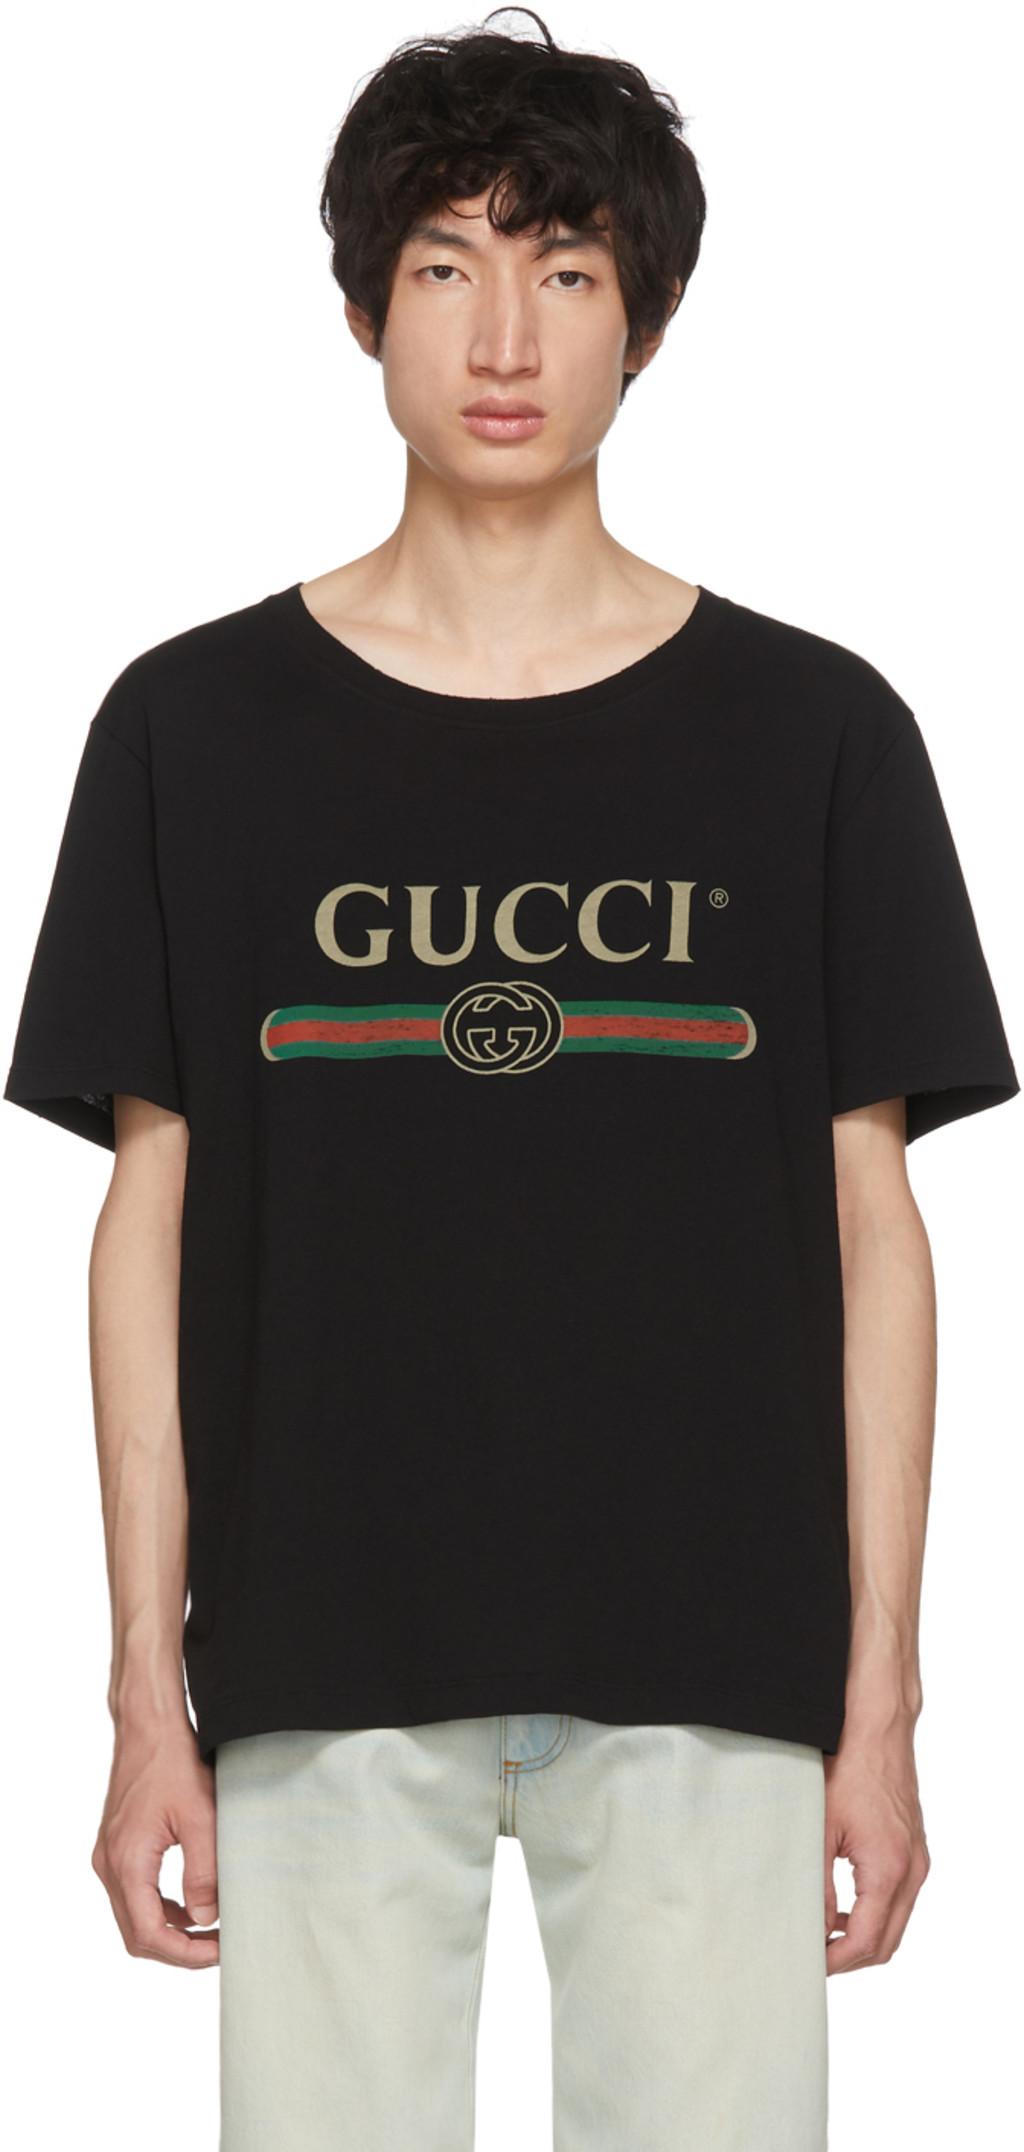 8e43f9e1ab4 Gucci Snake Polo Shirt Cheap